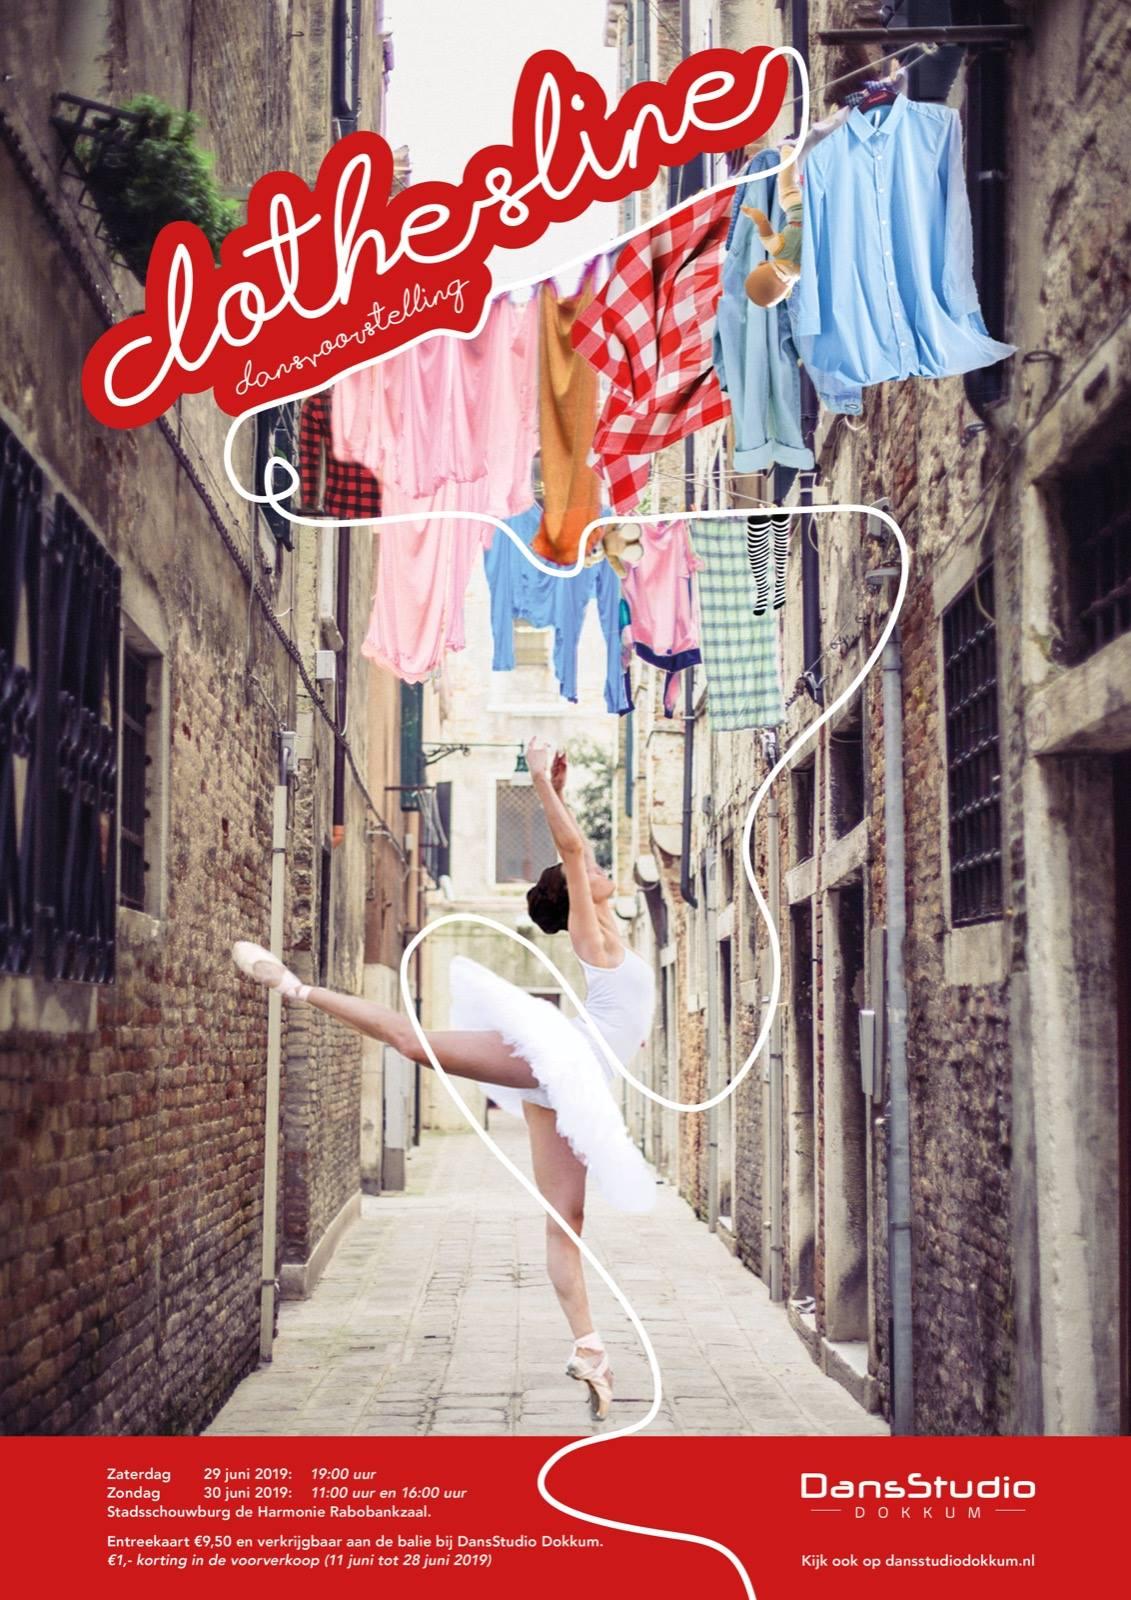 Dansvoorstelling Clothesline